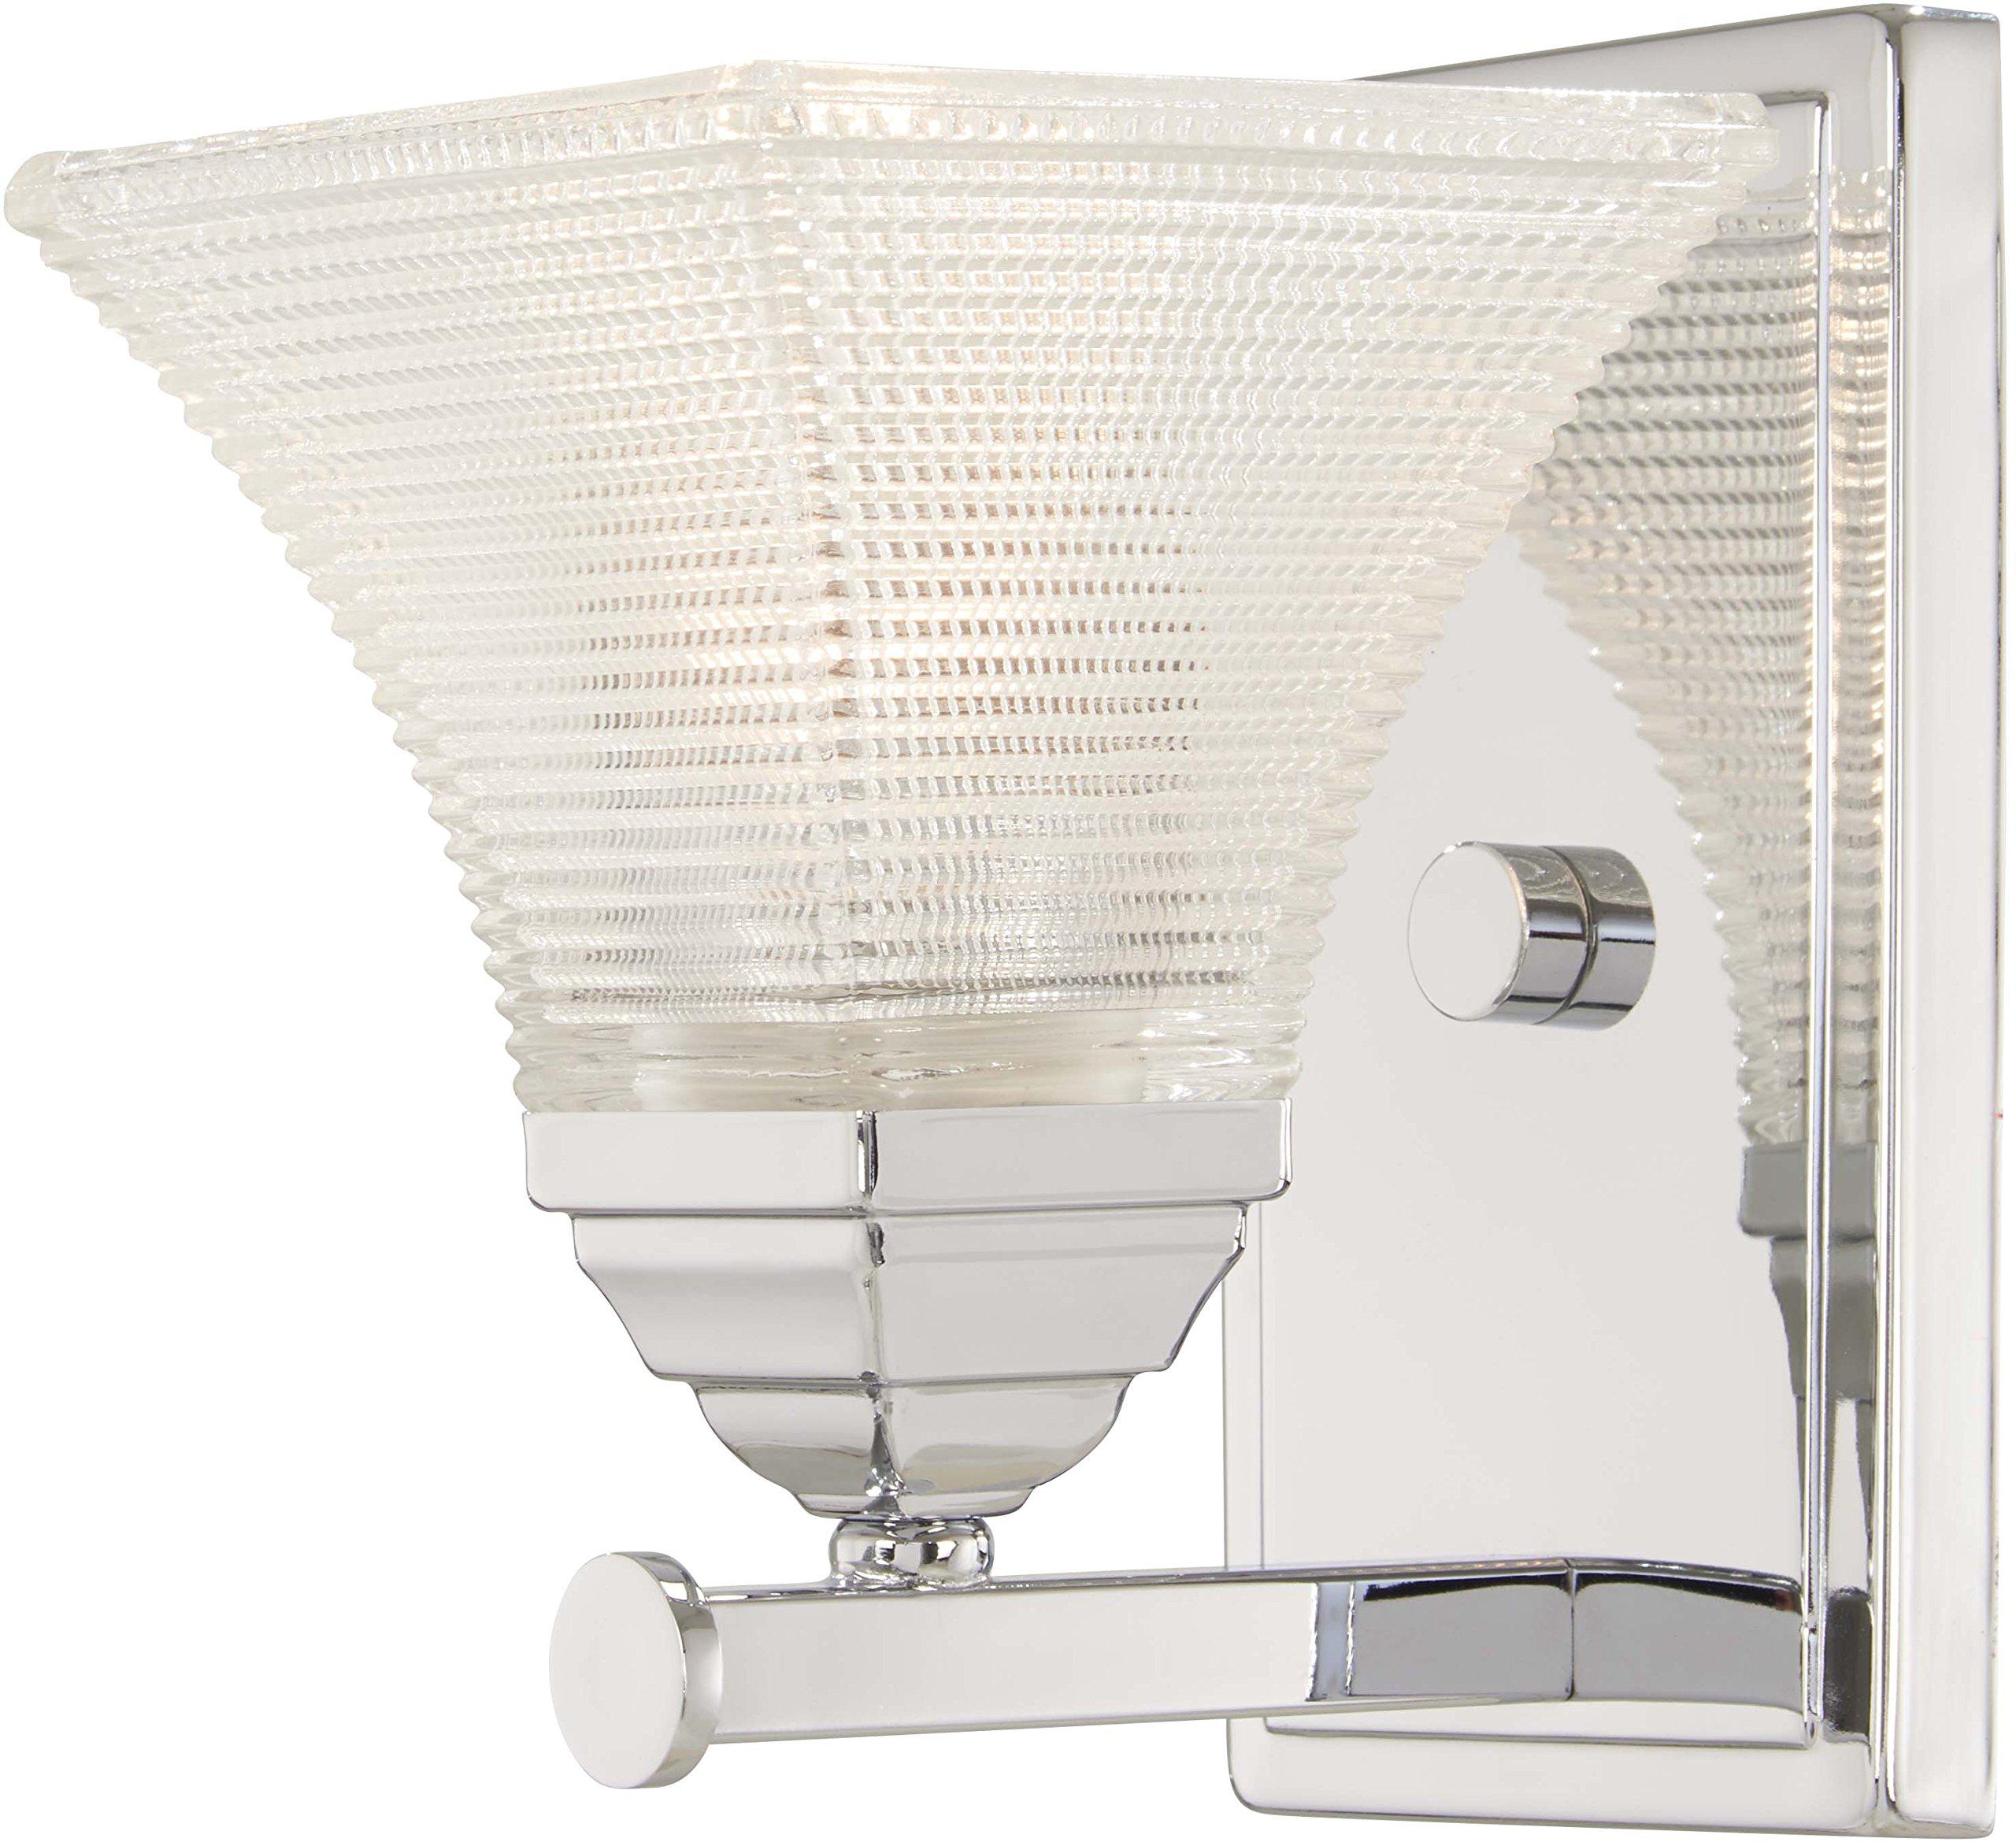 Minka Lavery Wall Sconce Lighting 4781-77 Conspire Wall Lamp Fixture, 1-Light 60 Watts, Chrome